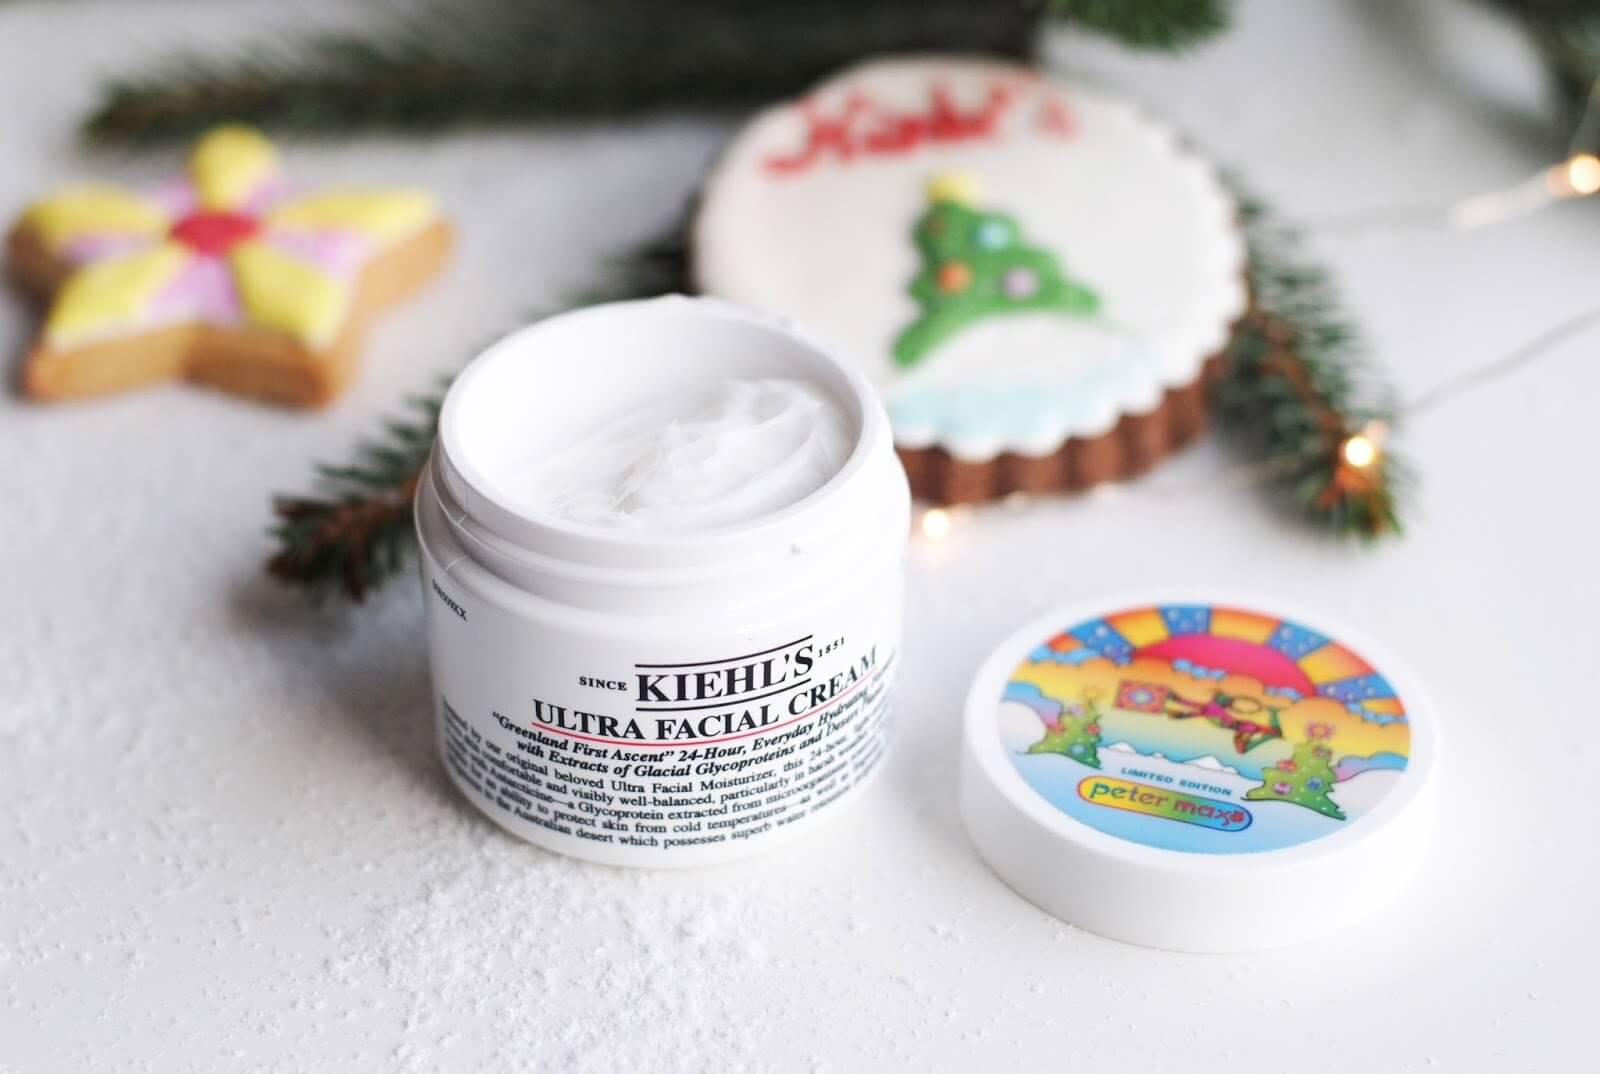 Kem dưỡng ẩm Ultra Facial Cream-bicicosmetics.vn